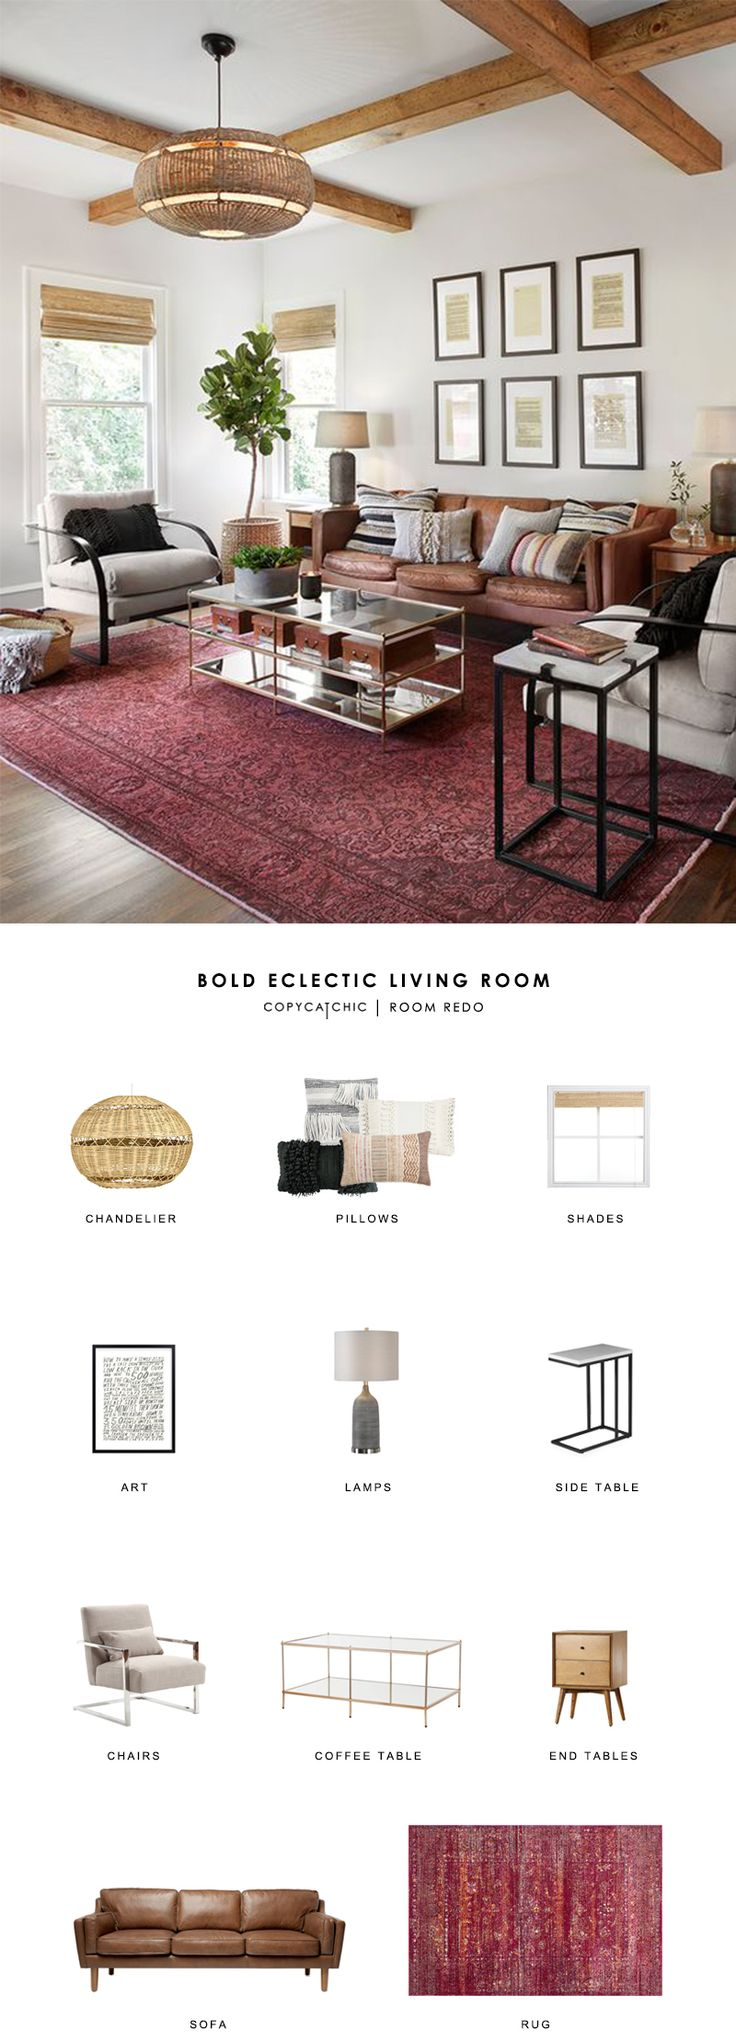 Room Redo | Bold Eclectic Living Room | Copy Cat Chic | Bloglovin'